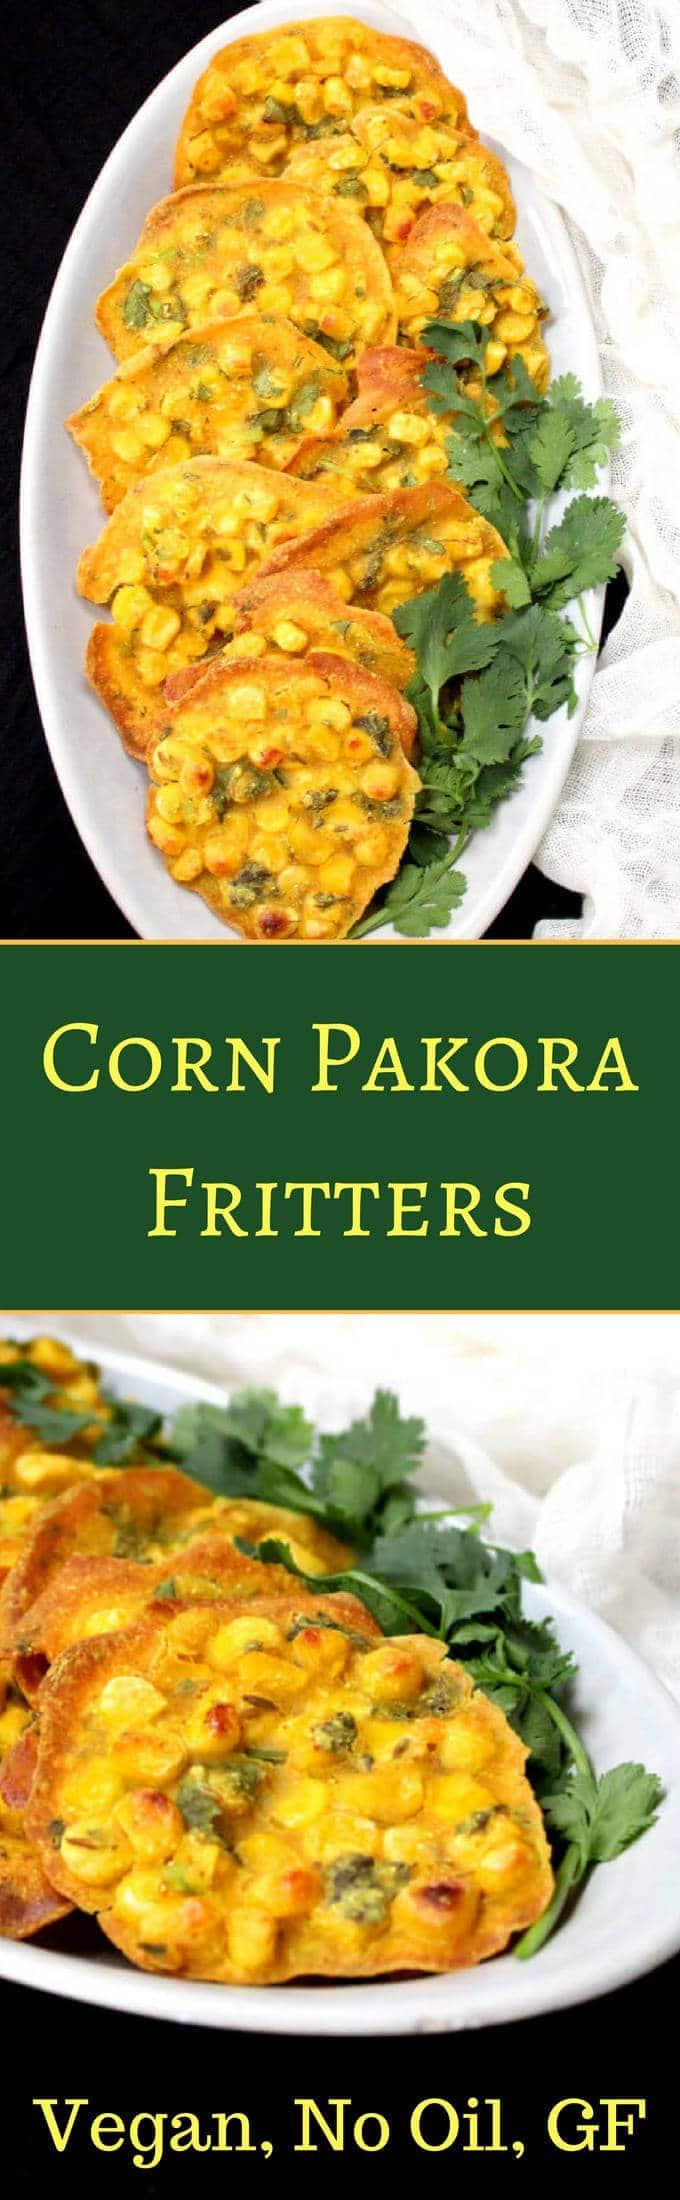 Corn Pakora Fritters, vegan, gluten-free, nut-free and soy-free. Holycowvegan.net